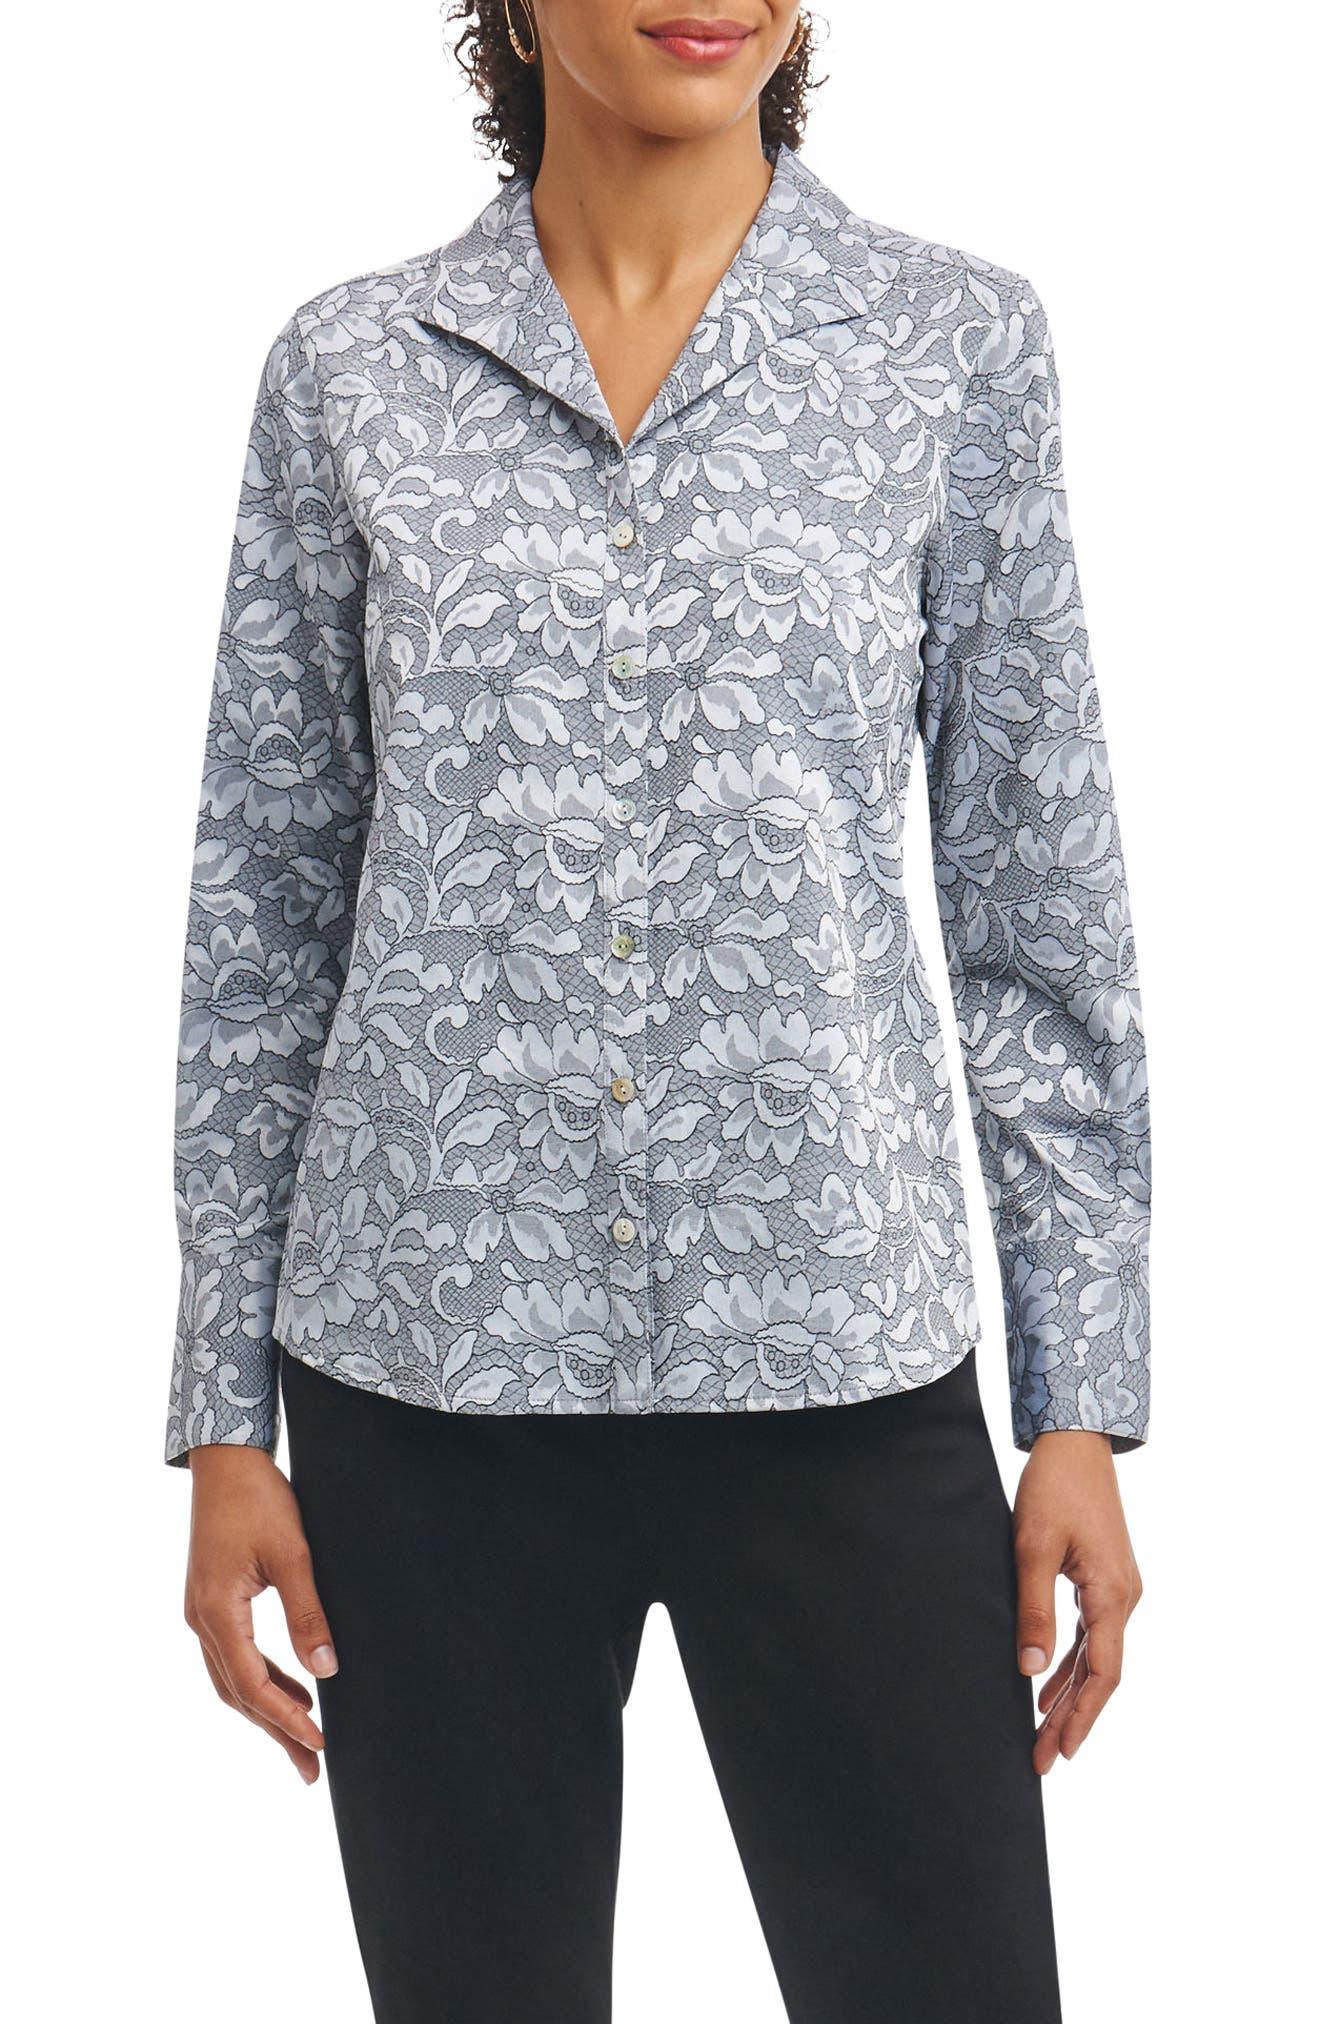 Alternate Image 1 Selected - Foxcroft Rhonda Wrinkle Free Lace Jacquard Shirt